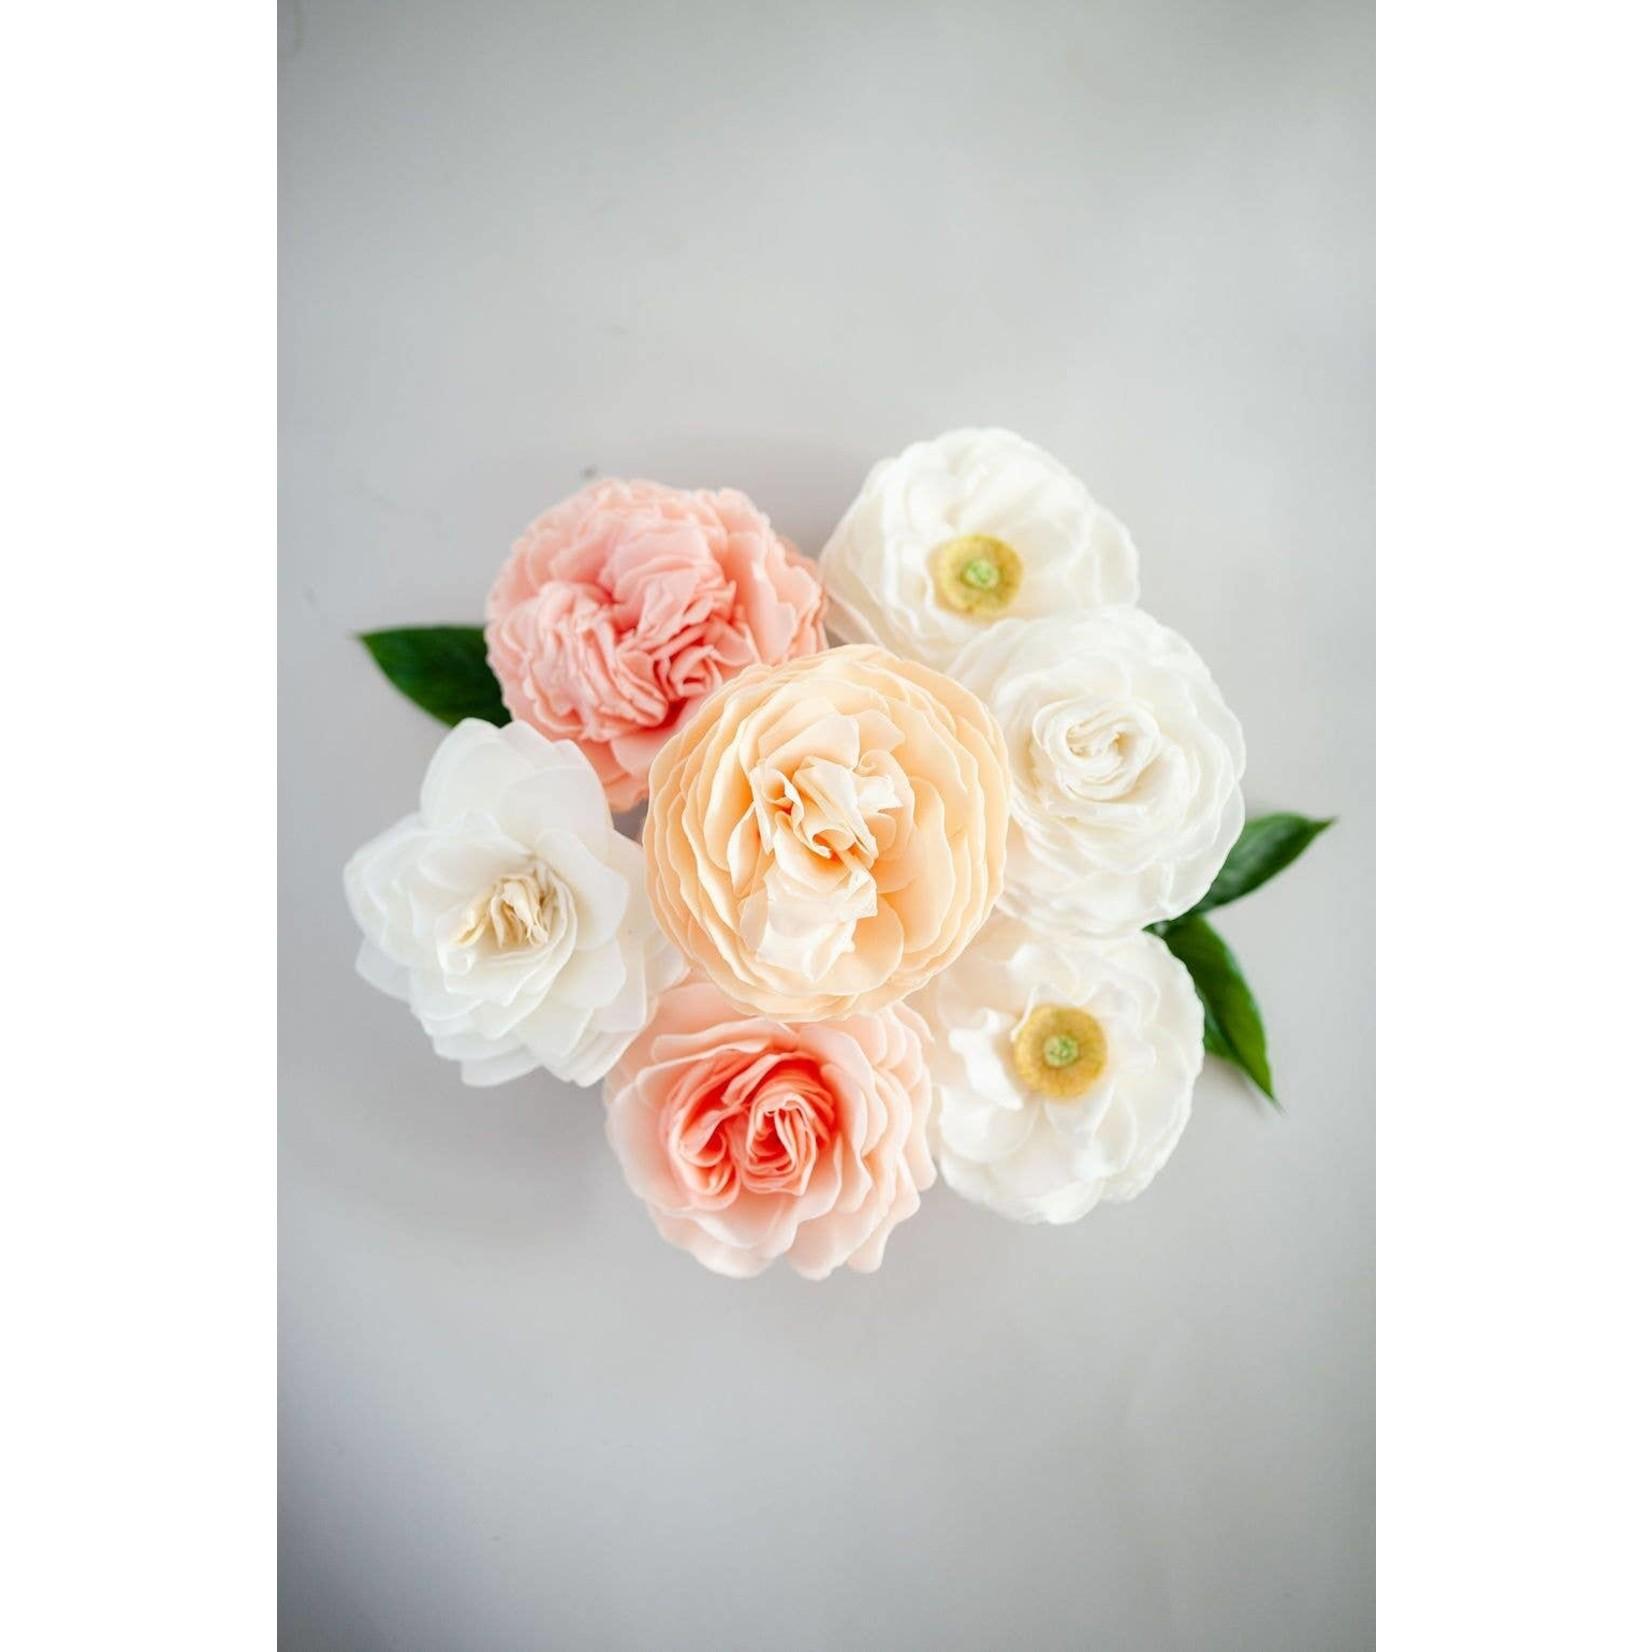 A'marie's Bath Flower Shop Heaven Scent Bathing Petal Soap Flower